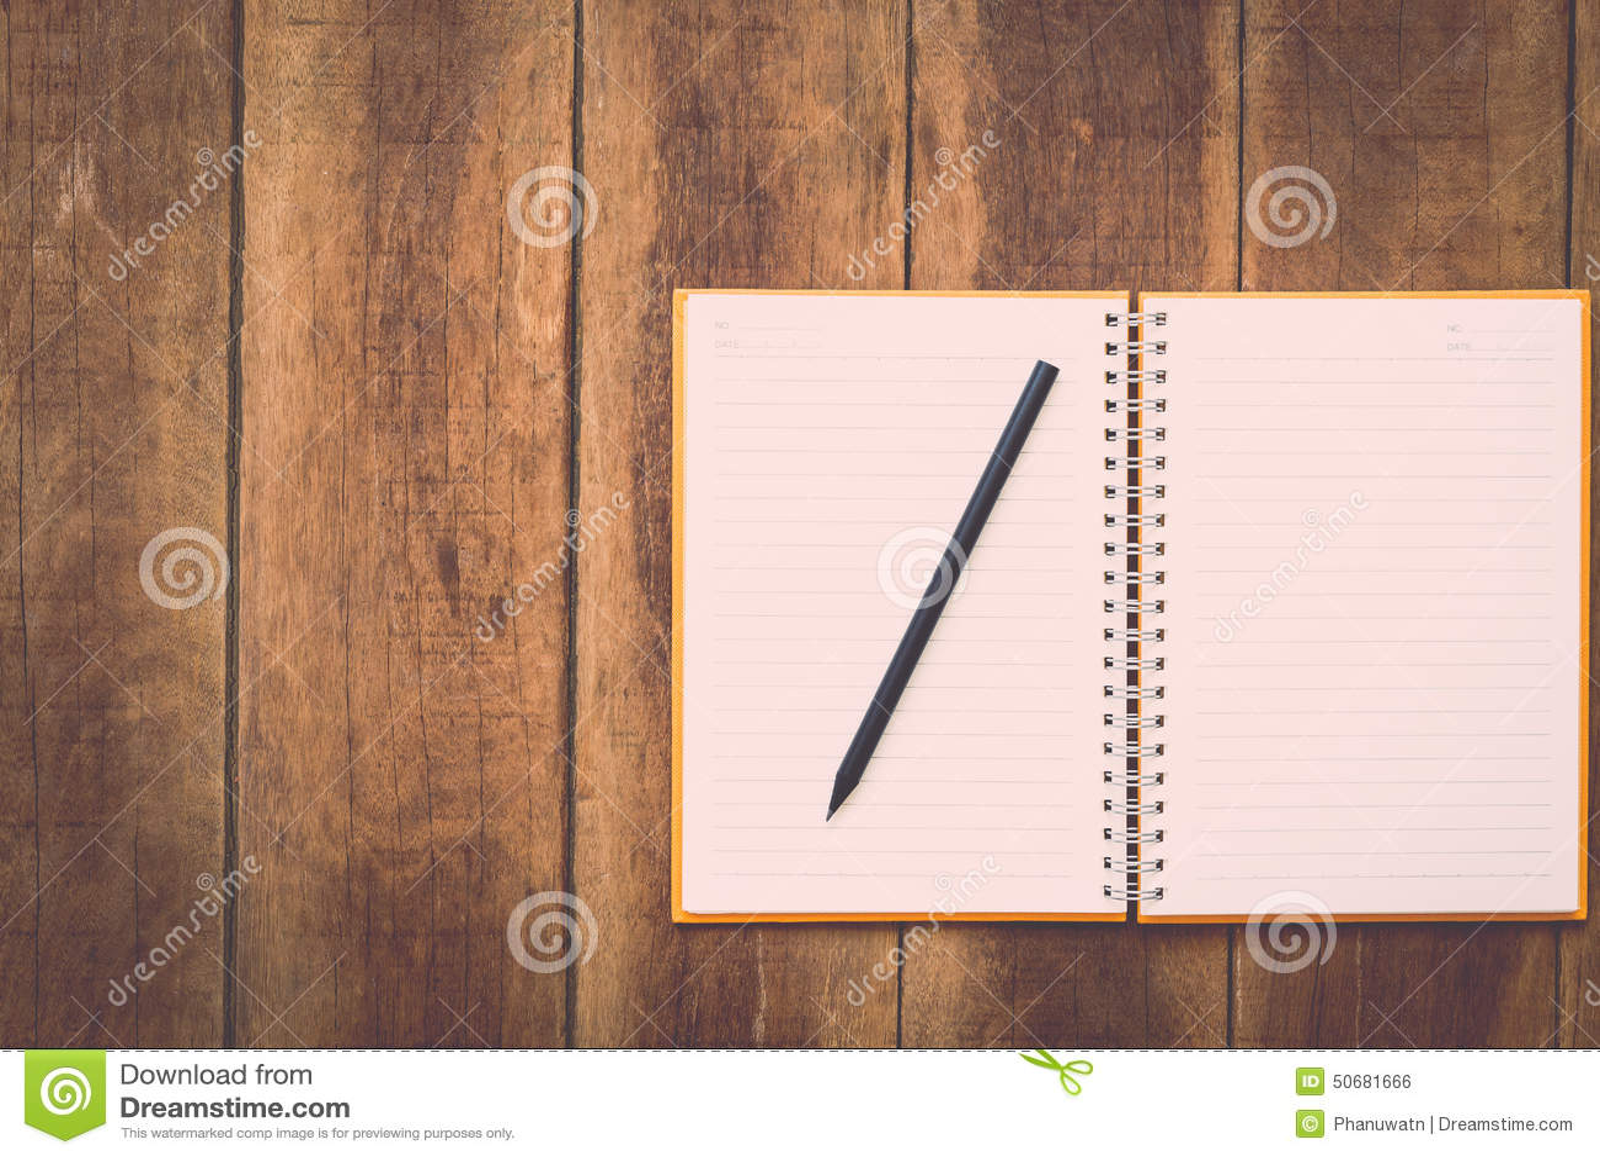 Download 笔记本和铅笔在木头 库存照片. 图片 包括有 笔记本, 空间, 木头, 钉书匠, 文件, 写生簿, 空白的 - 50681666